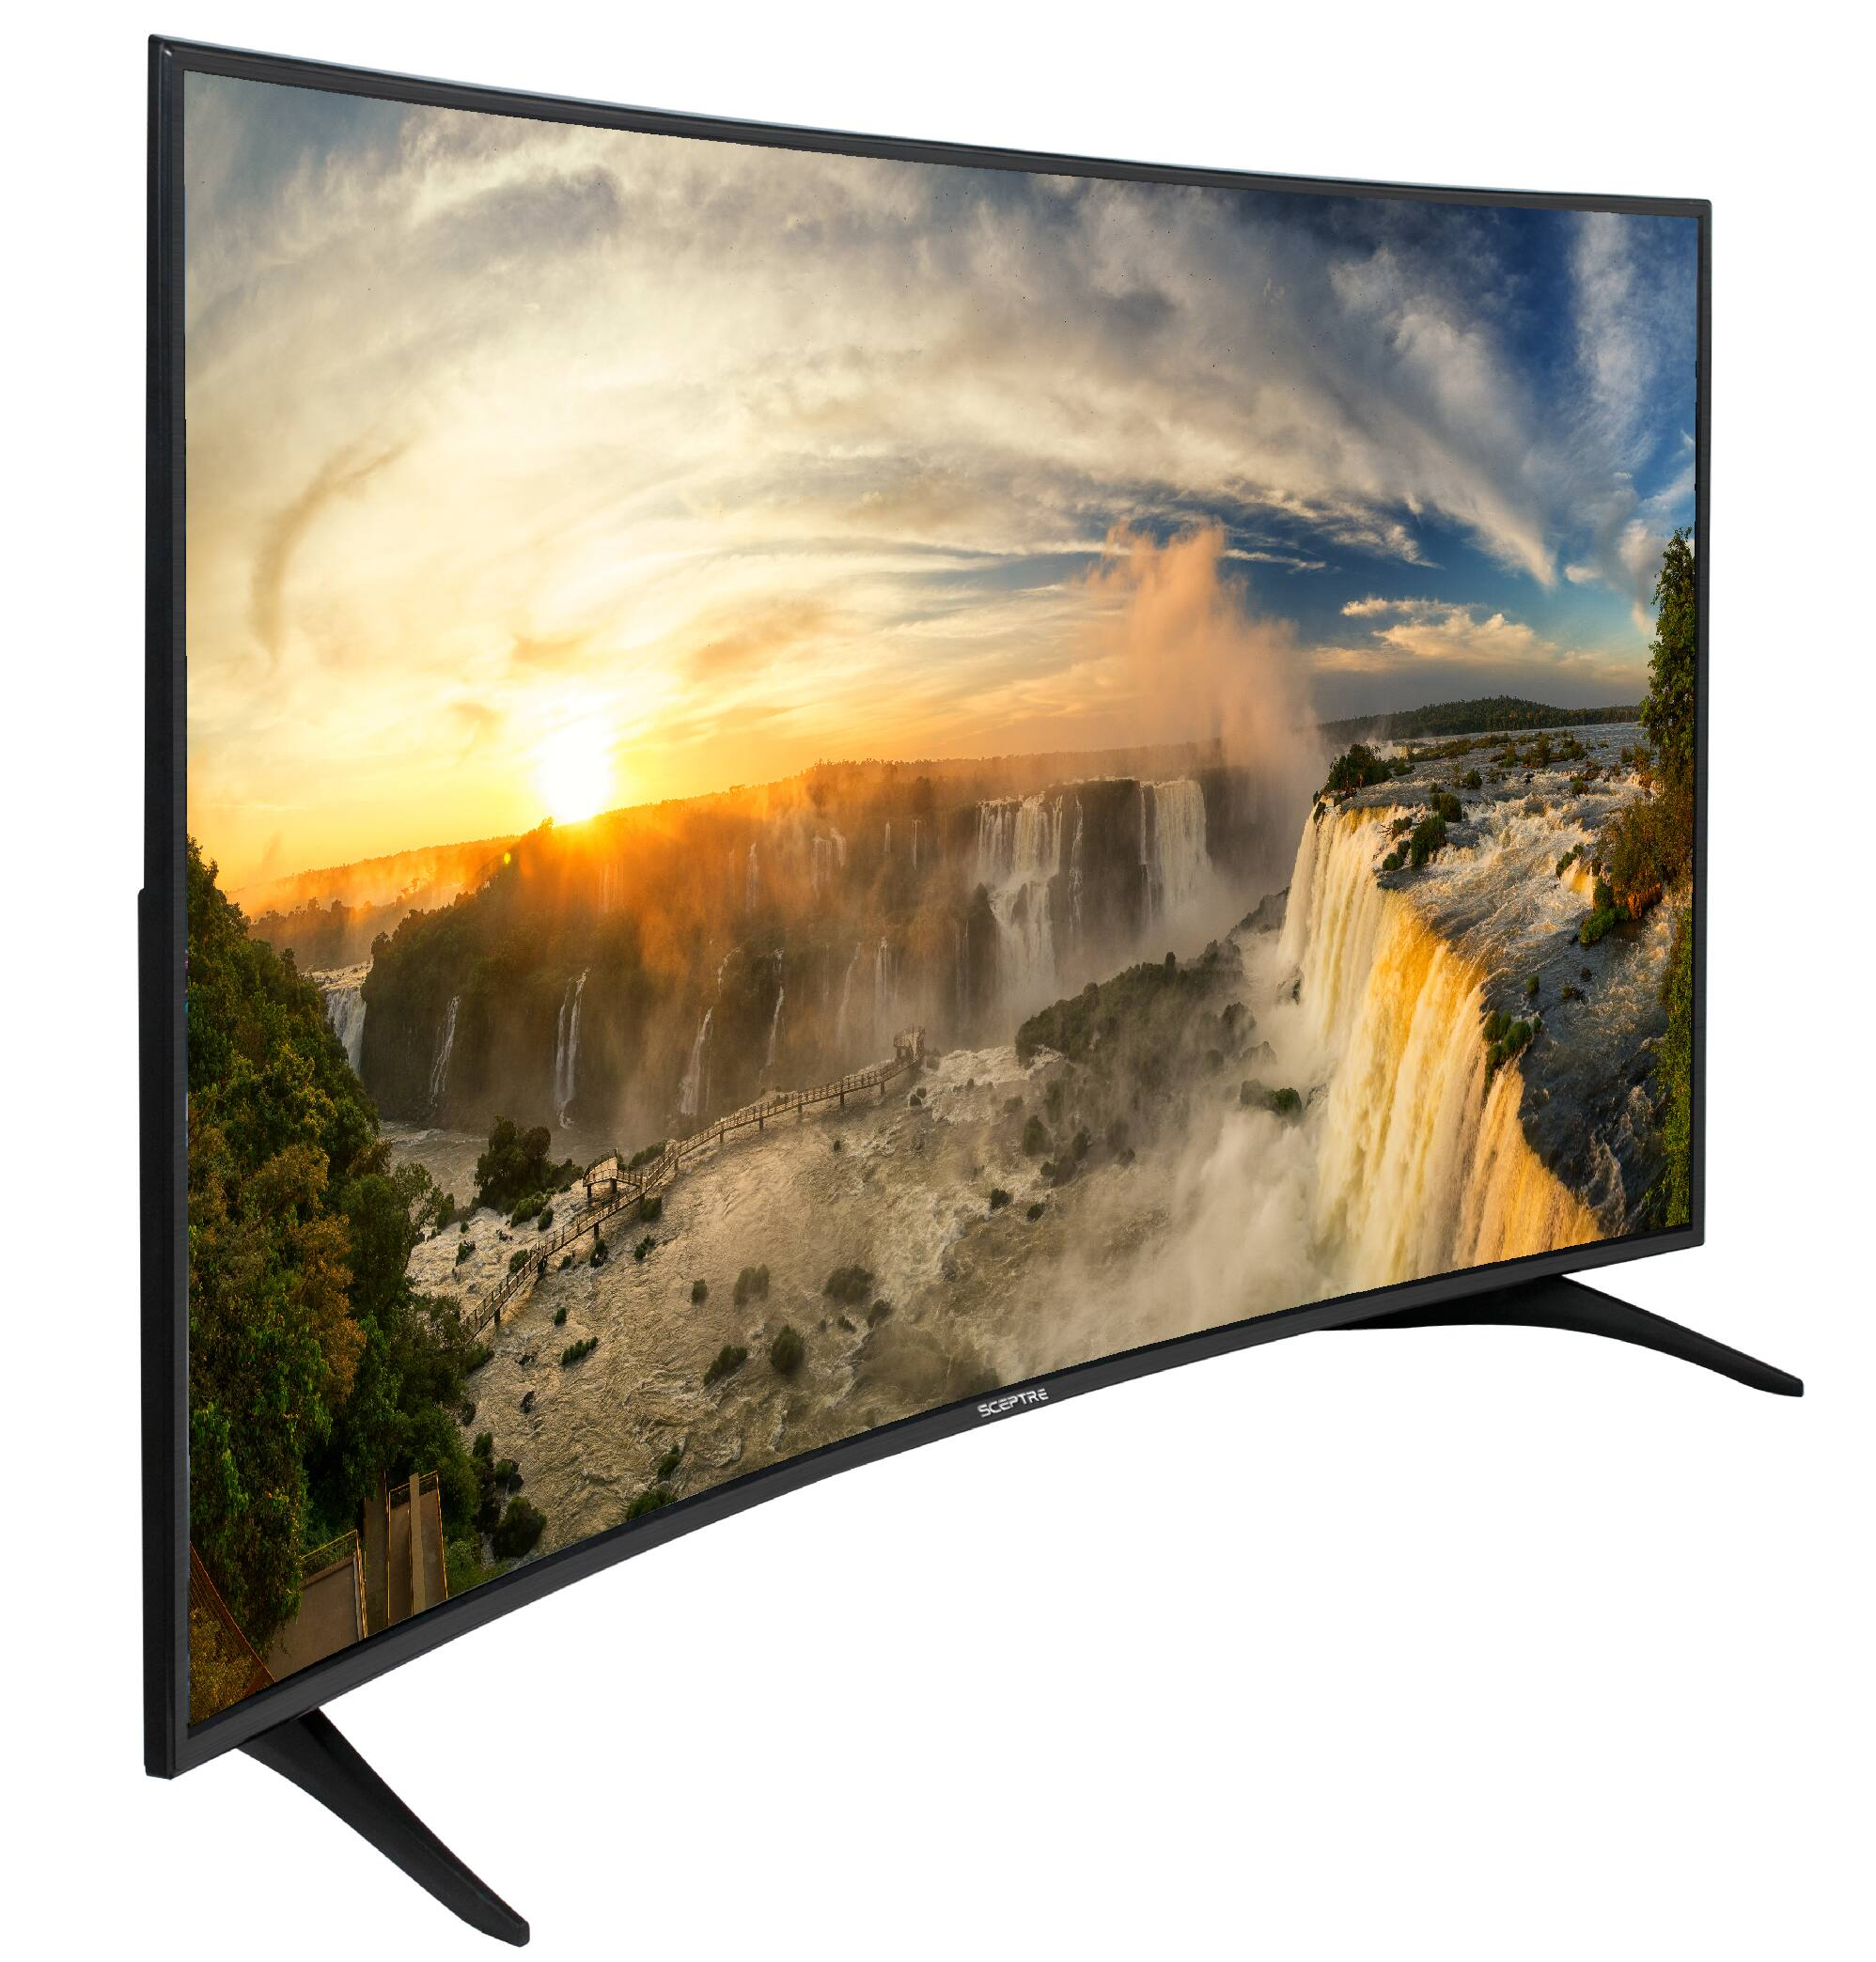 "Sceptre 65"" Class HD (2160P) 4K Curved LED TV (C650CV-U) $449.99"